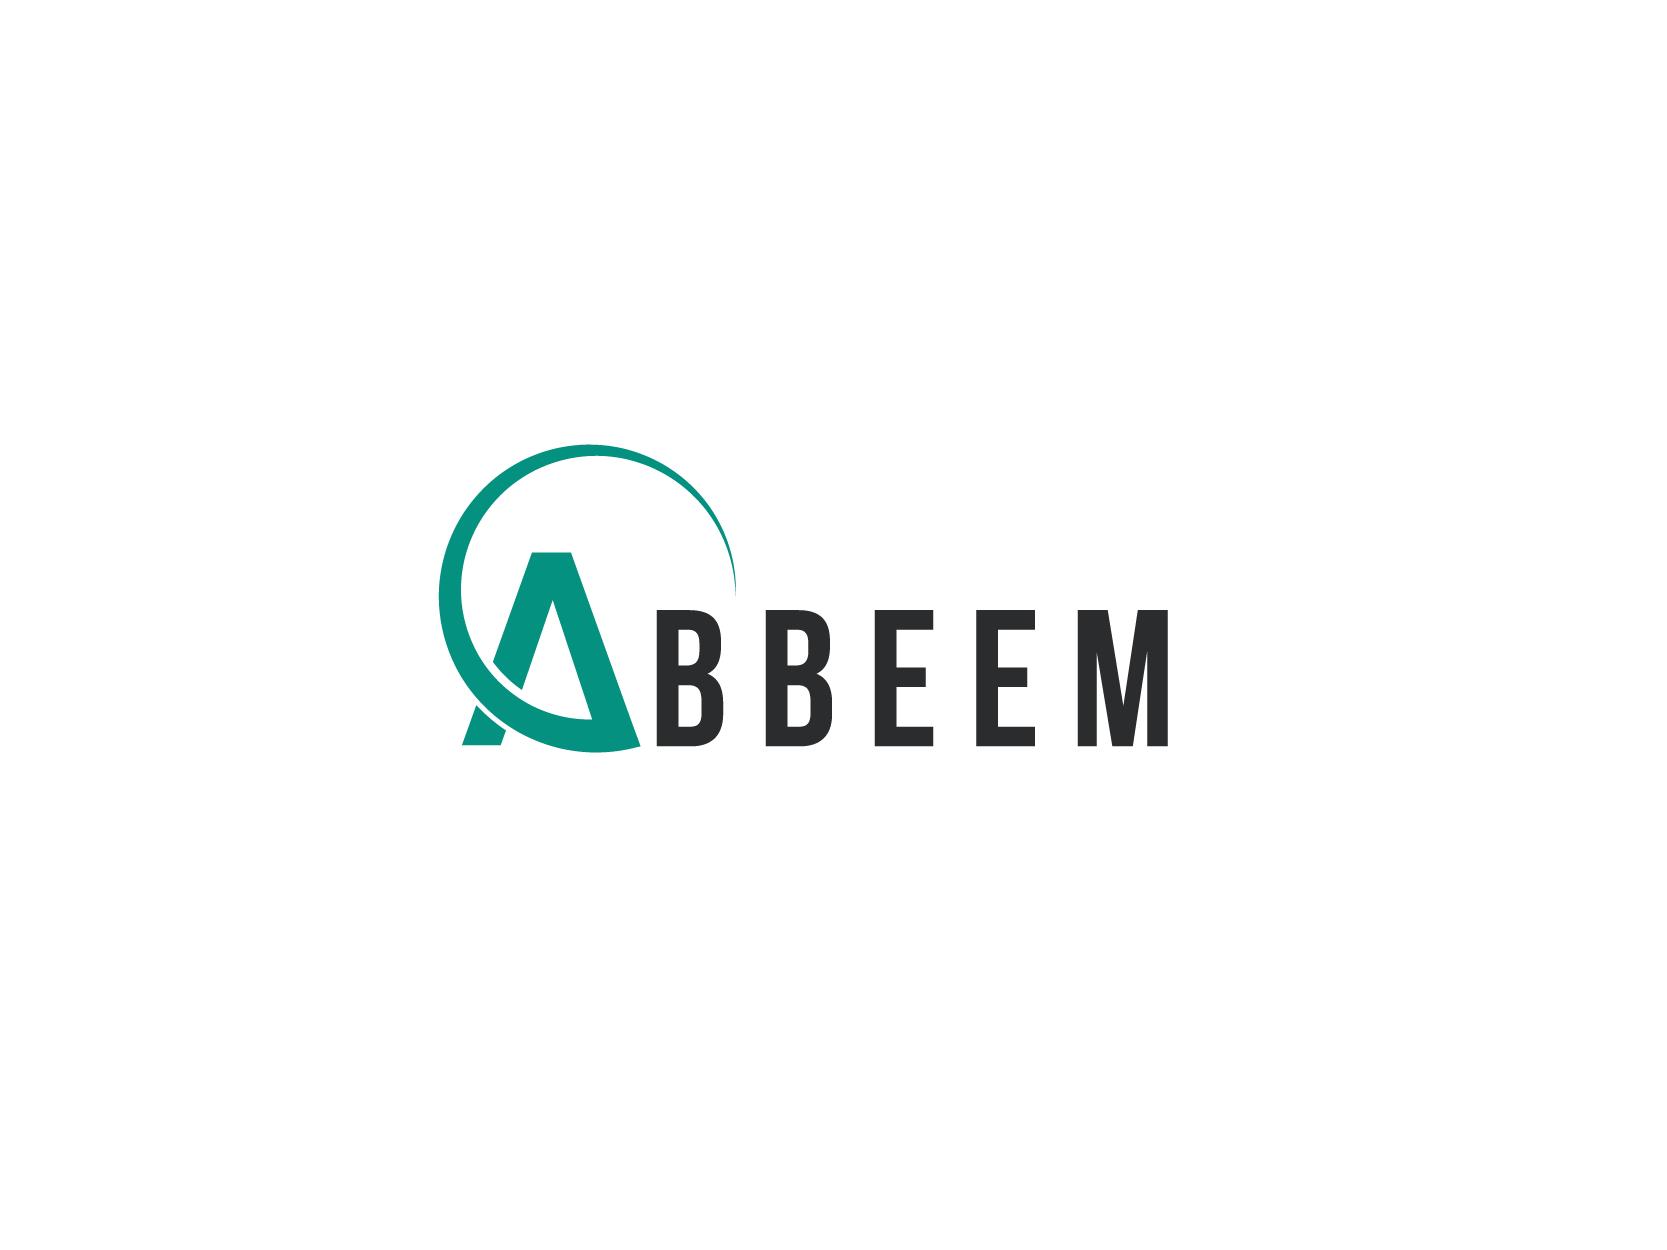 Logo Design by Faraz Baloch - Entry No. 160 in the Logo Design Contest Luxury Logo Design for Abbeem.